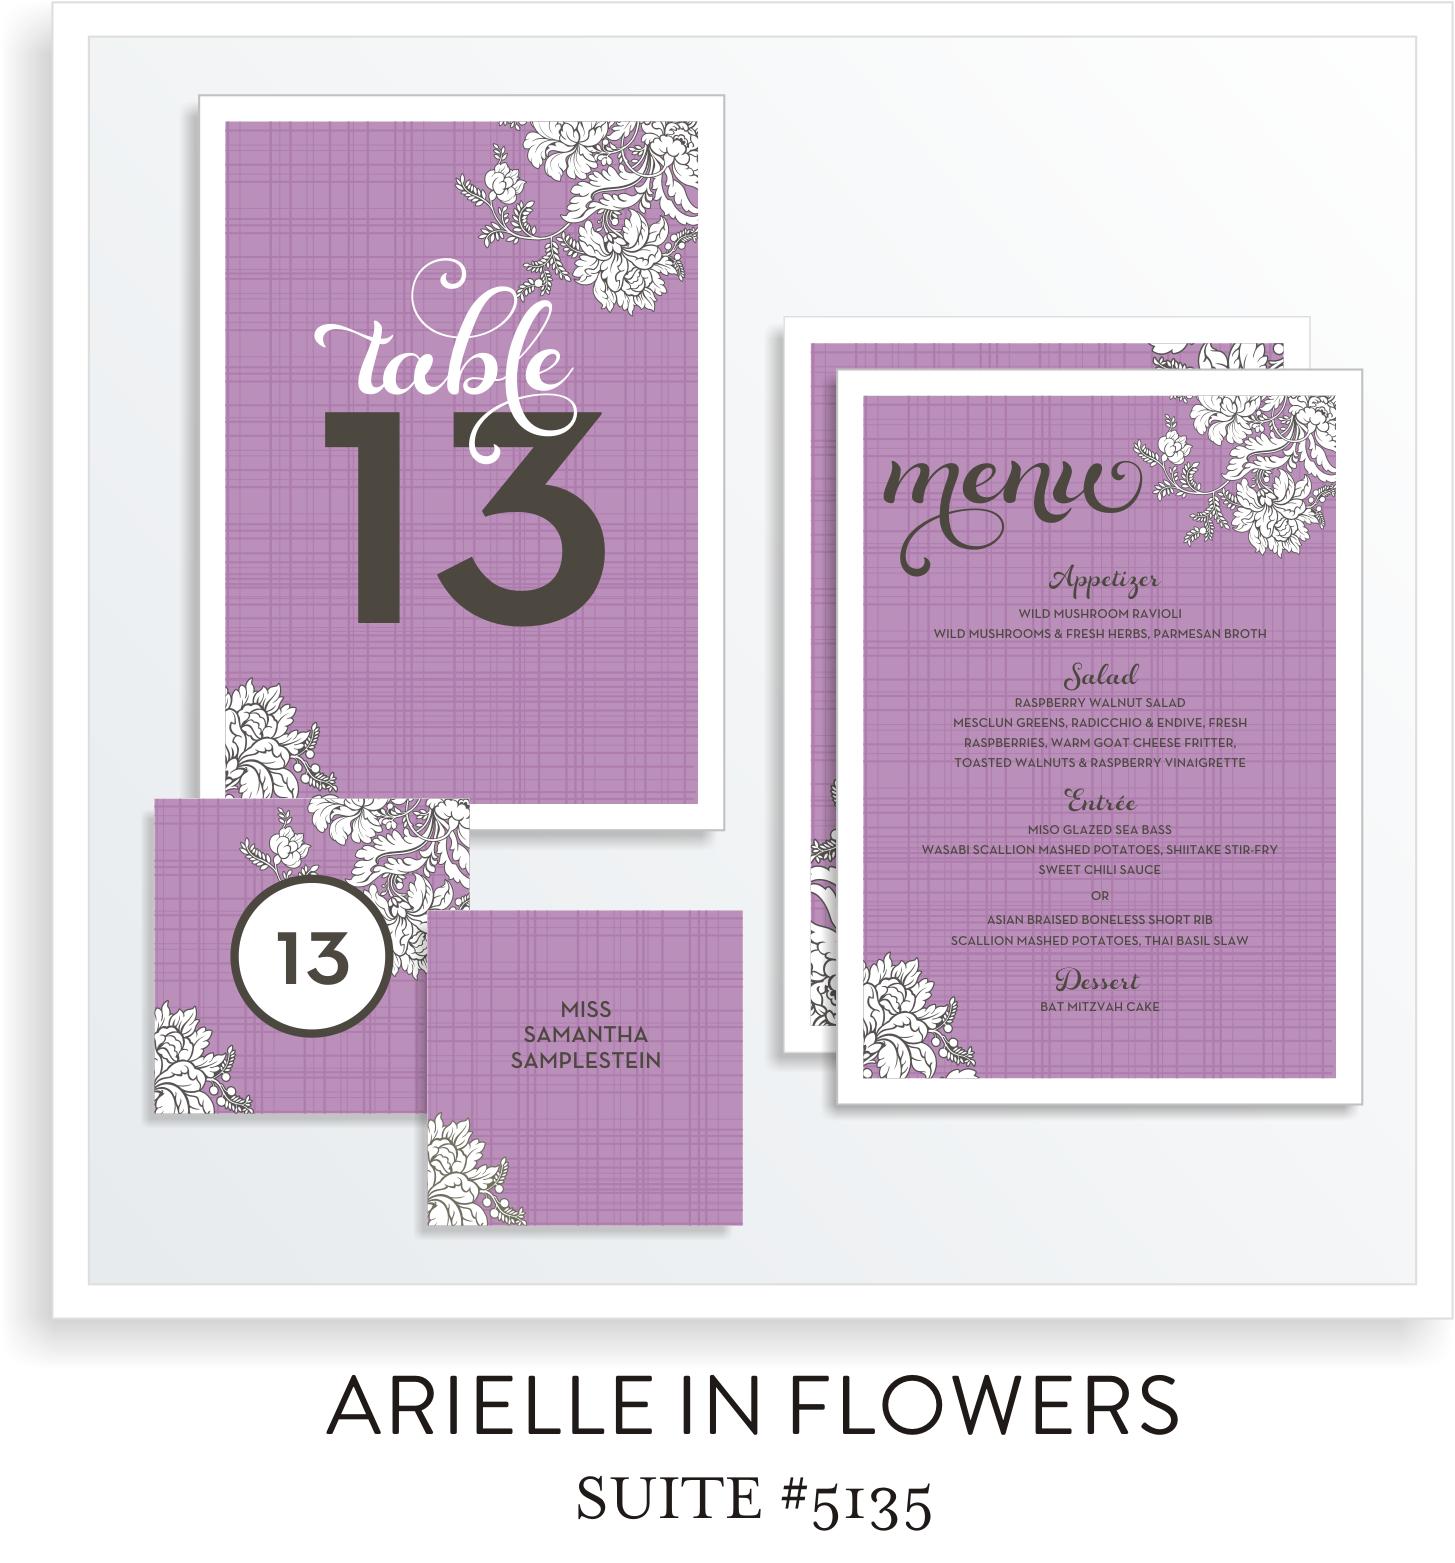 Table Top Decor Bat Mitzvah Suite 5135 - Arielle in Flowers